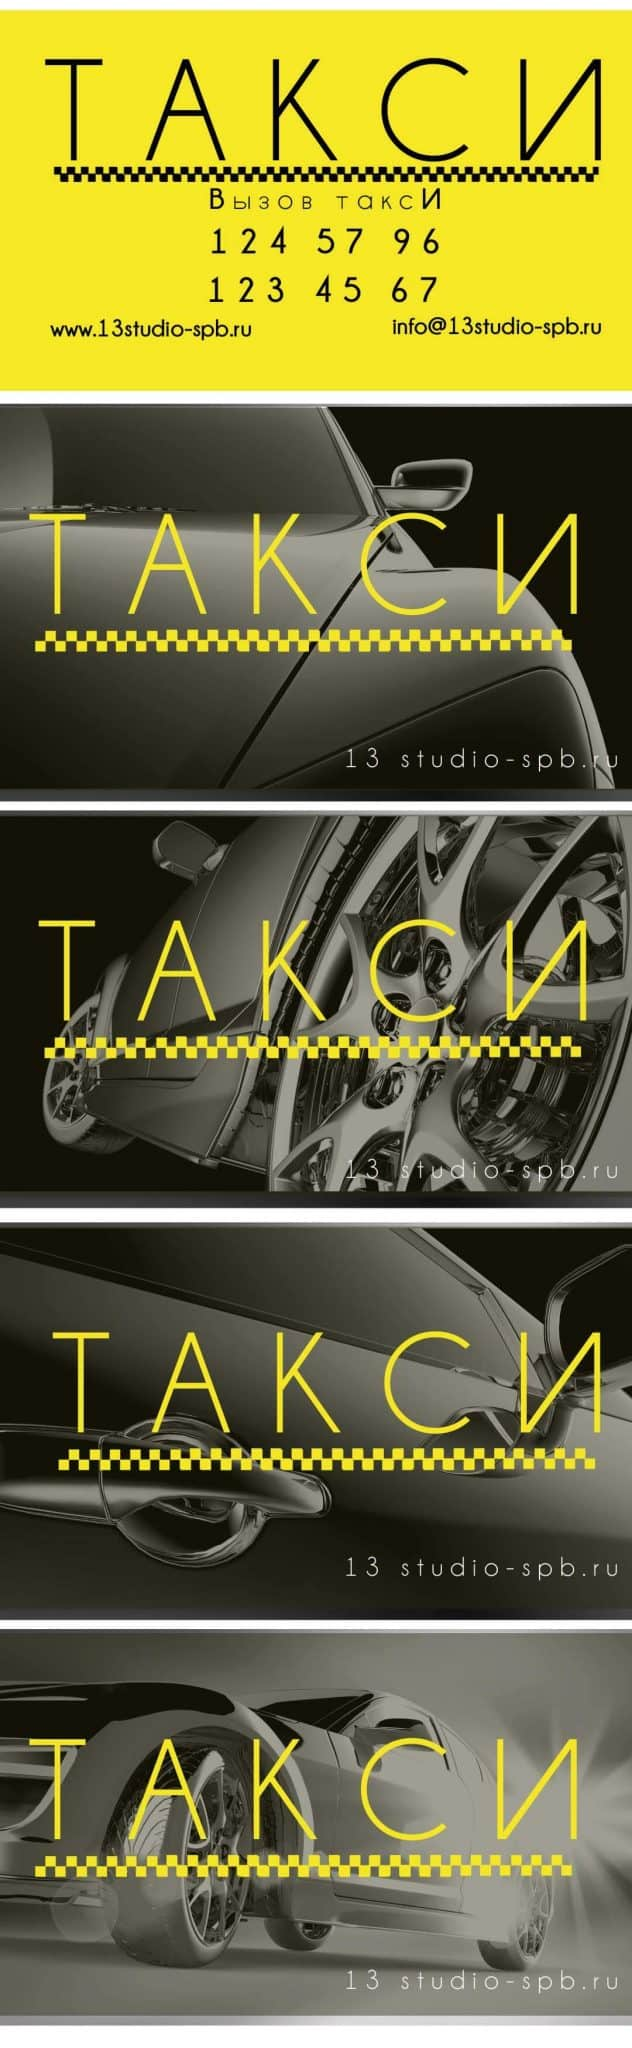 5 такси демо